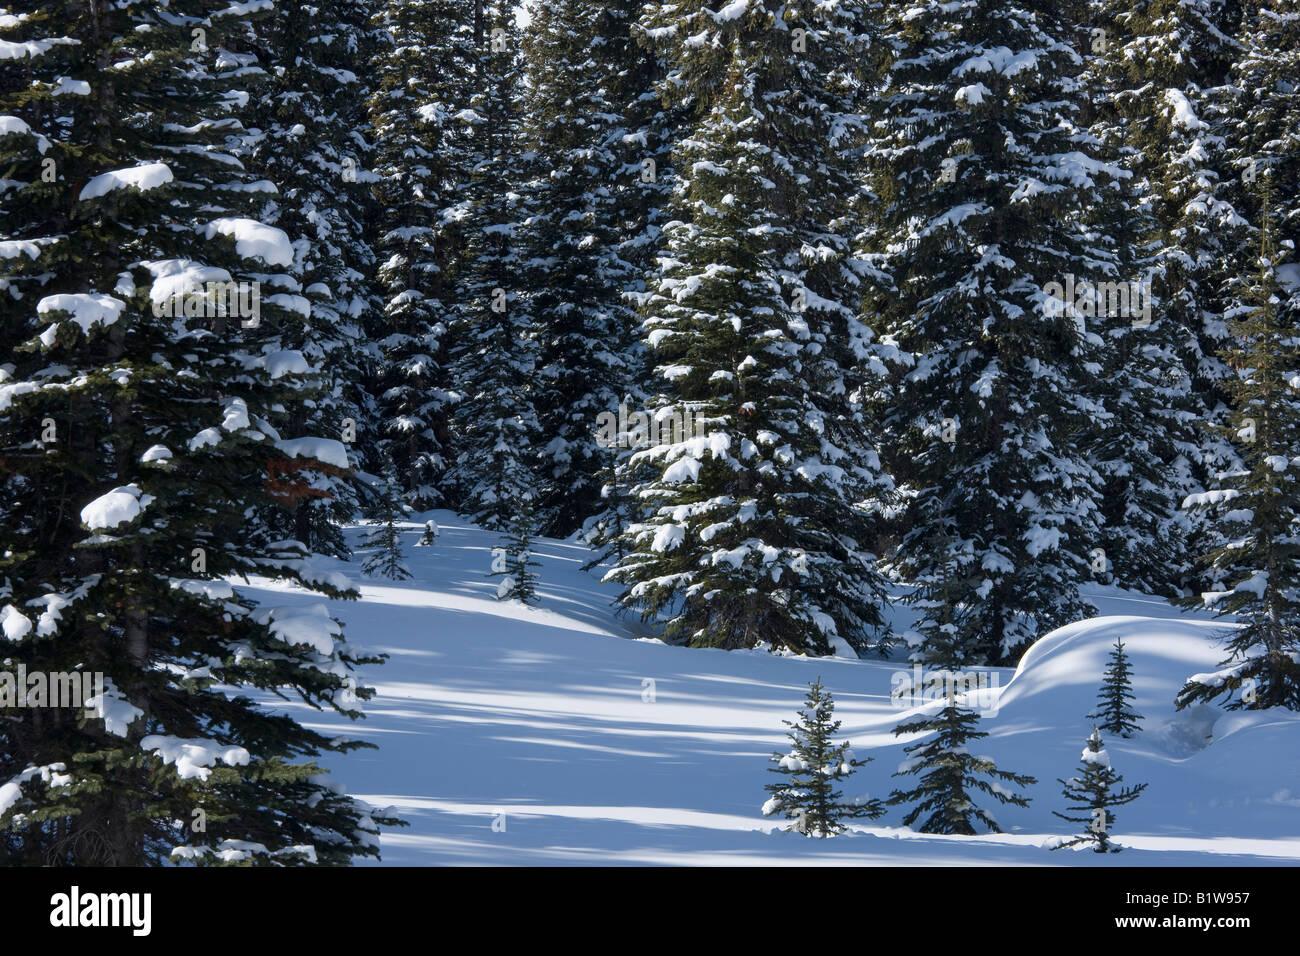 Kanada Alberta Banff National Park schneebedeckte Tannen Stockbild